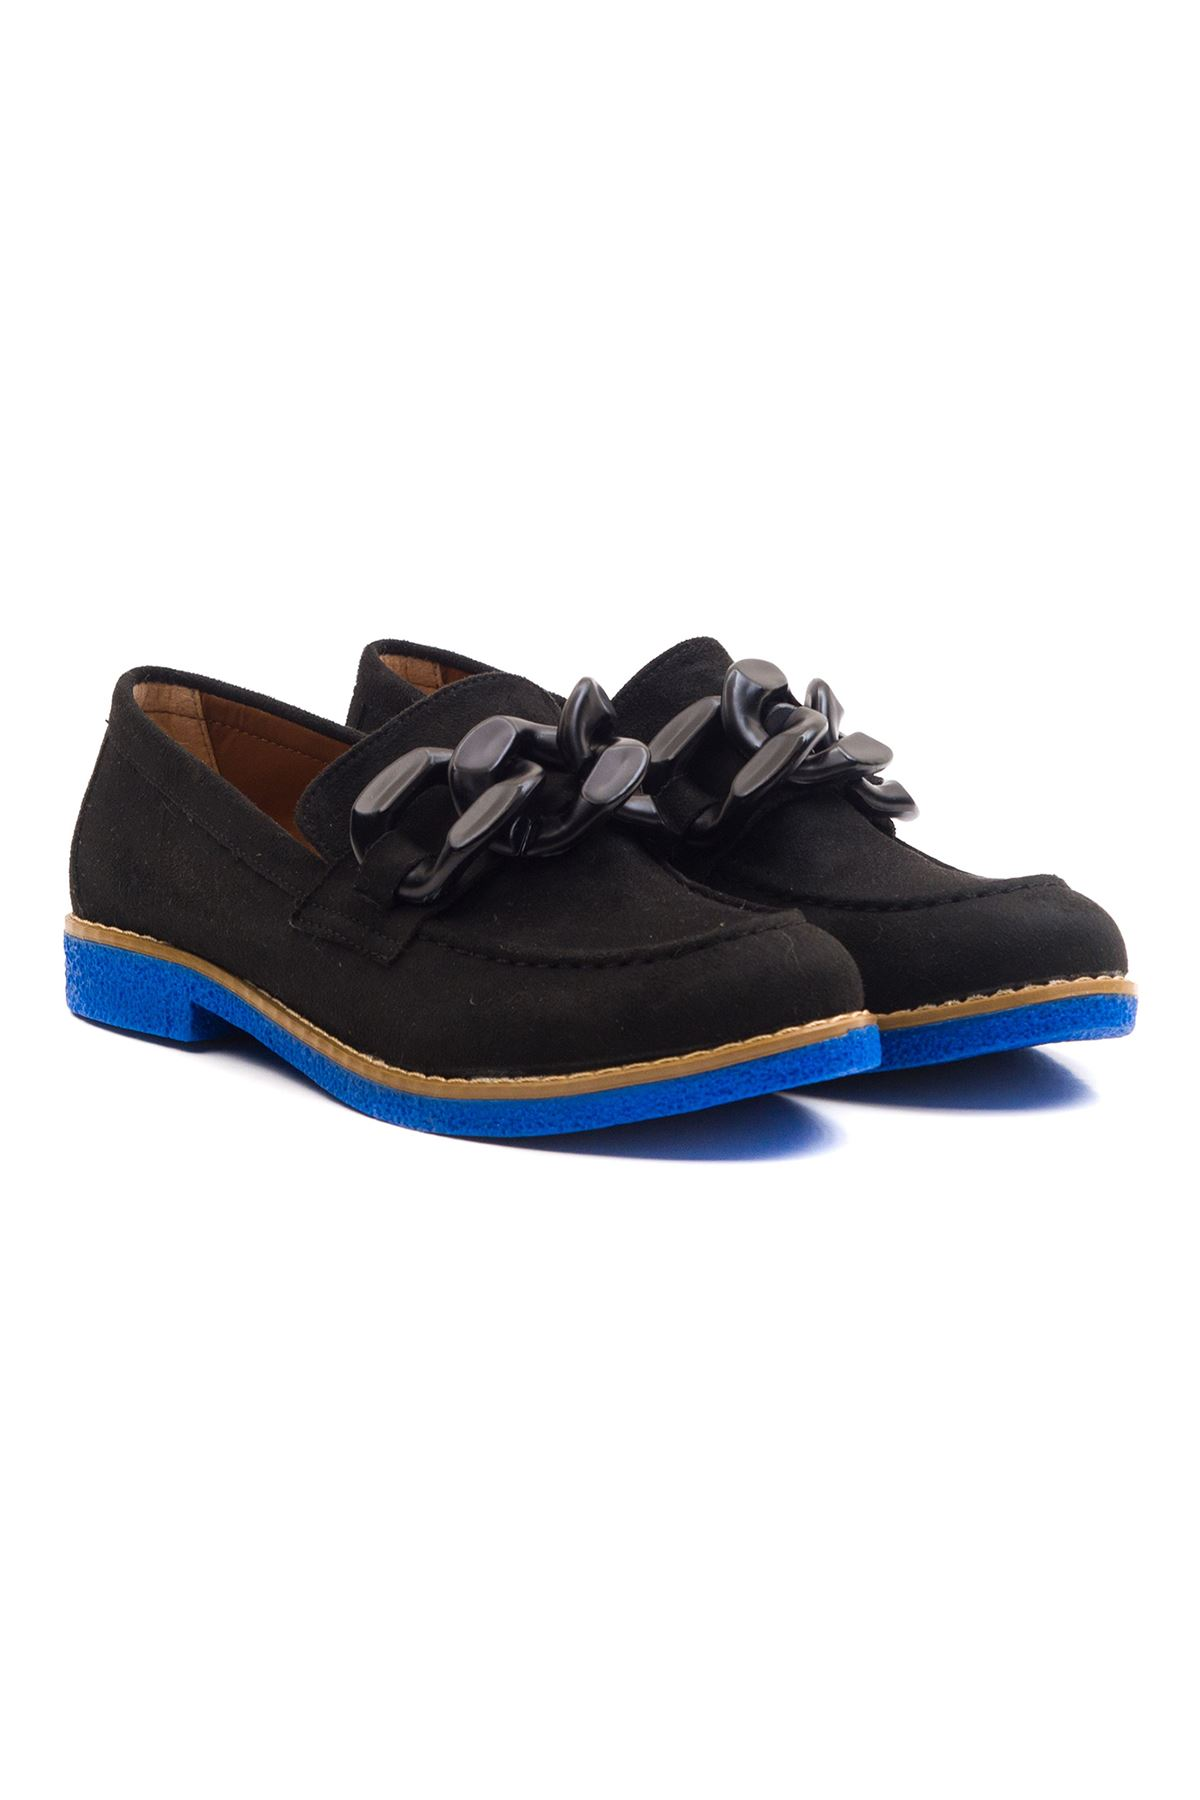 Violaces Kadın Ayakkabı Siyah Süet Saks Taban